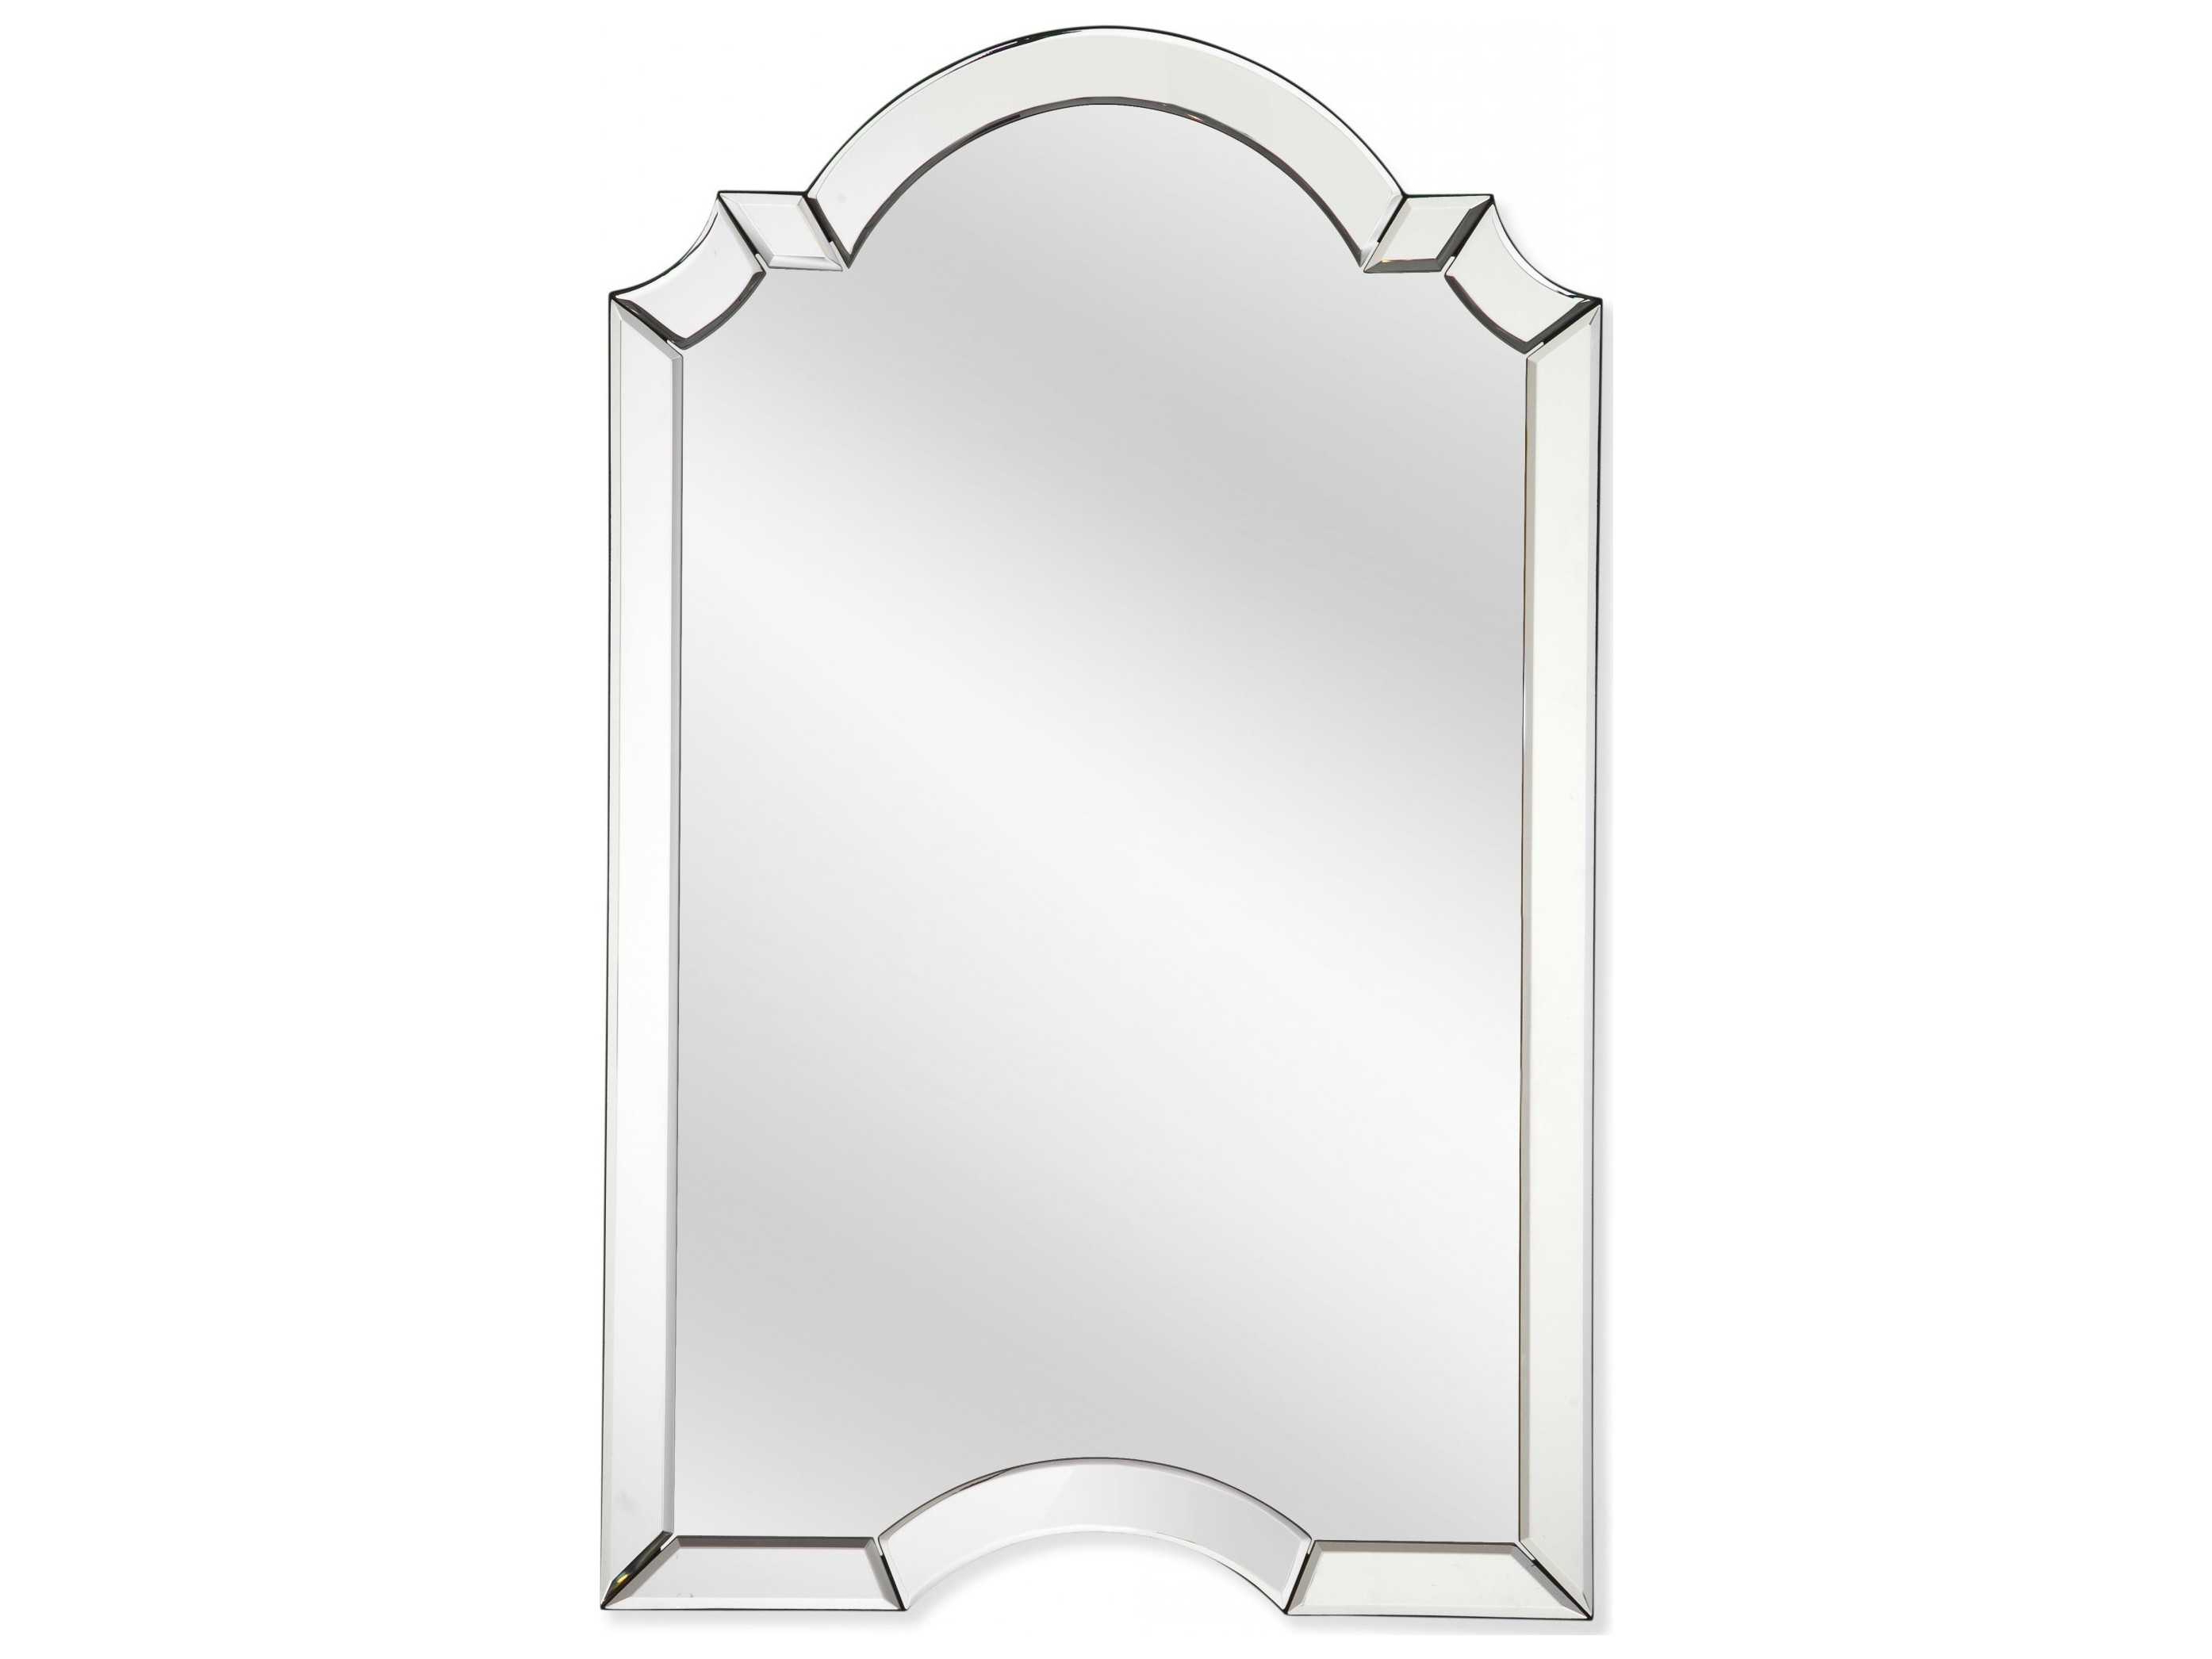 Preferred Bassett Wall Mirrors Pertaining To Bassett Mirror Old World 21 X 33 Emerson Wall Mirror (View 6 of 20)